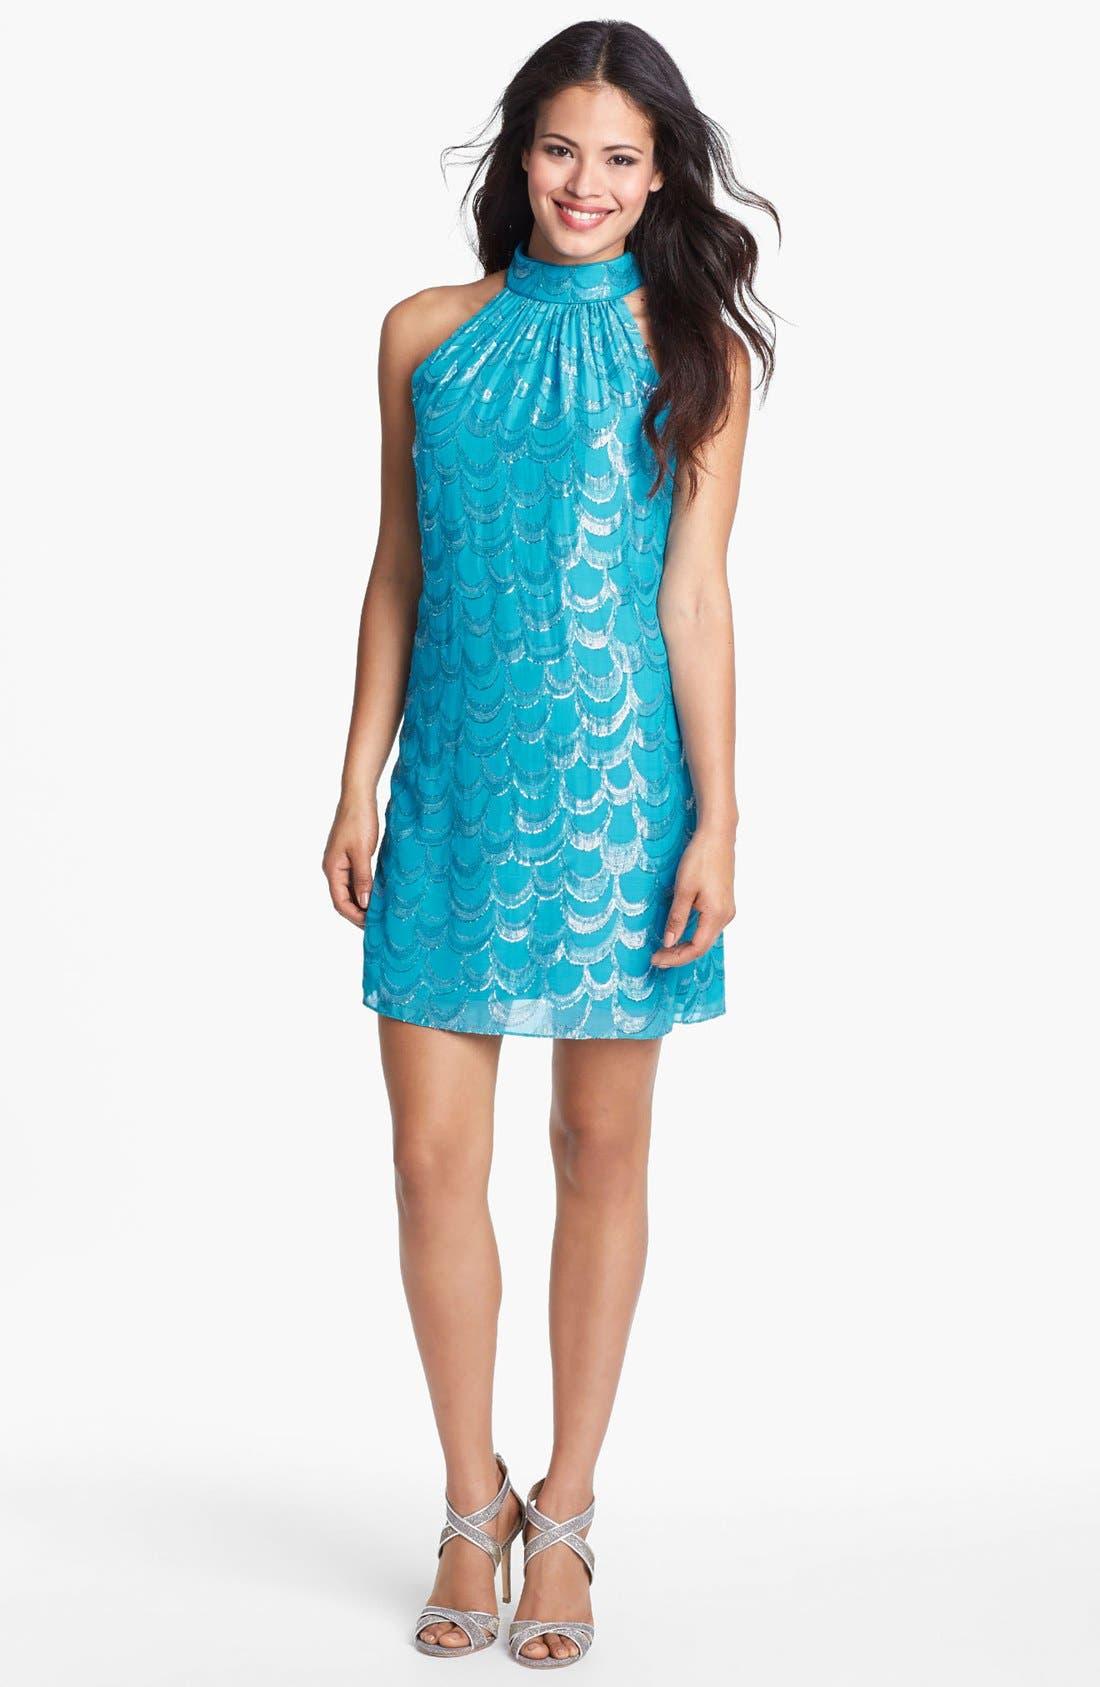 Alternate Image 1 Selected - Laundry by Shelli Segal Metallic Back Bow Trapeze Dress